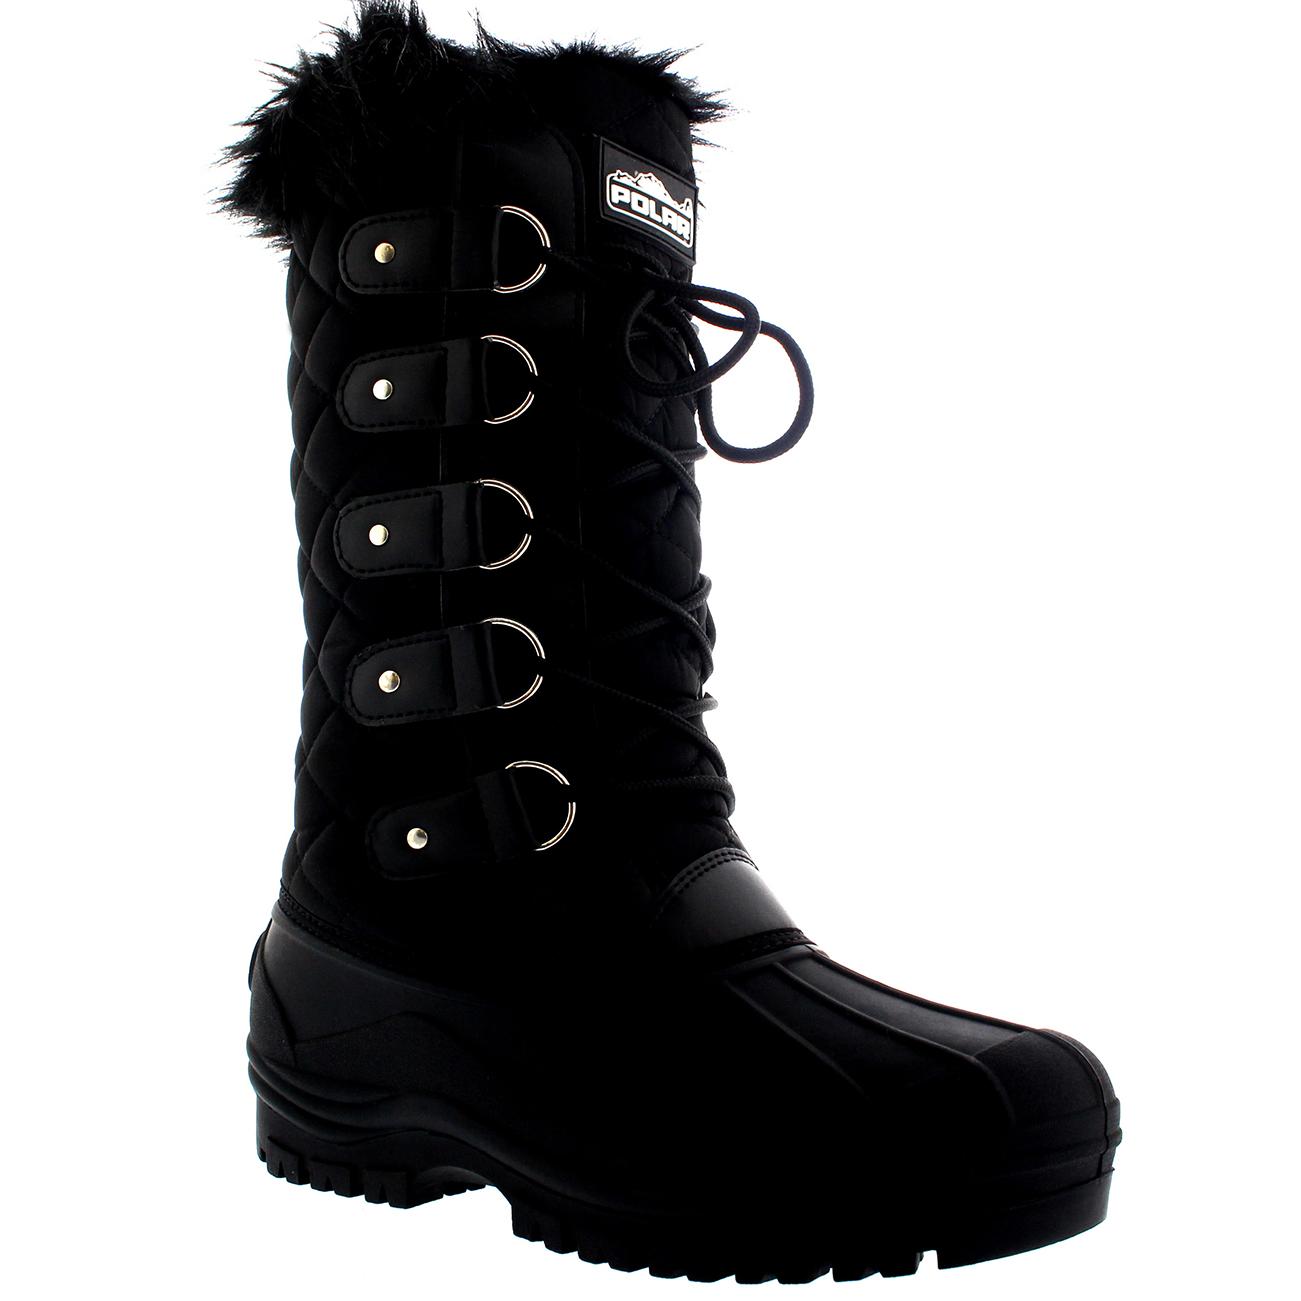 Womens Faux Fur Tactical Mountain Waterproof Knee High Walking Boots UK 3-10